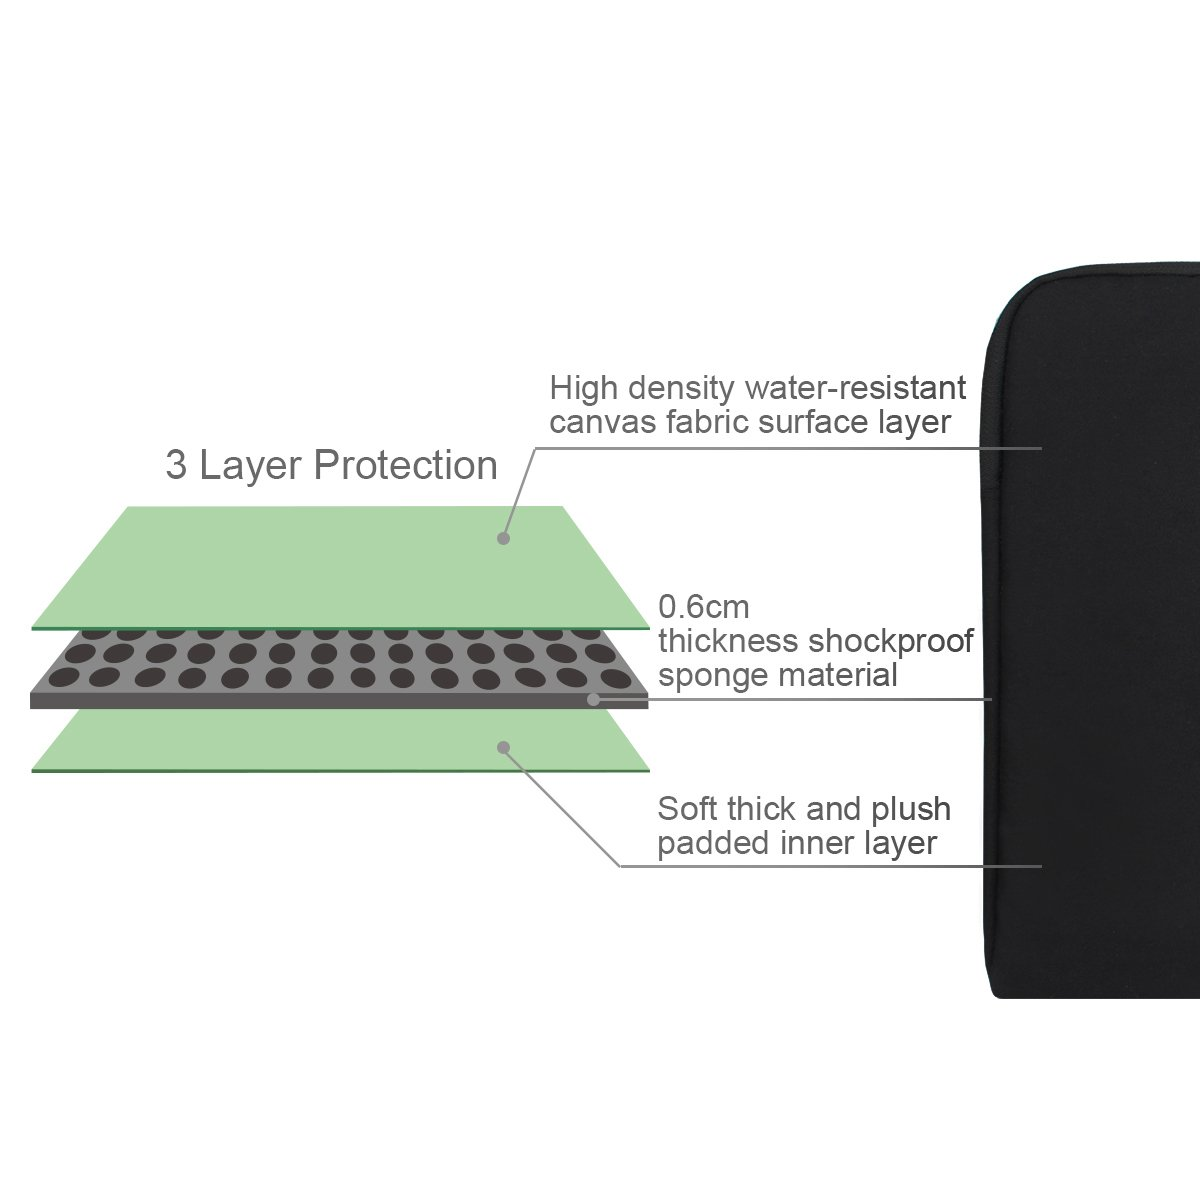 HP Pavilion 10-e010nr Mediatek Bluetooth Treiber Herunterladen